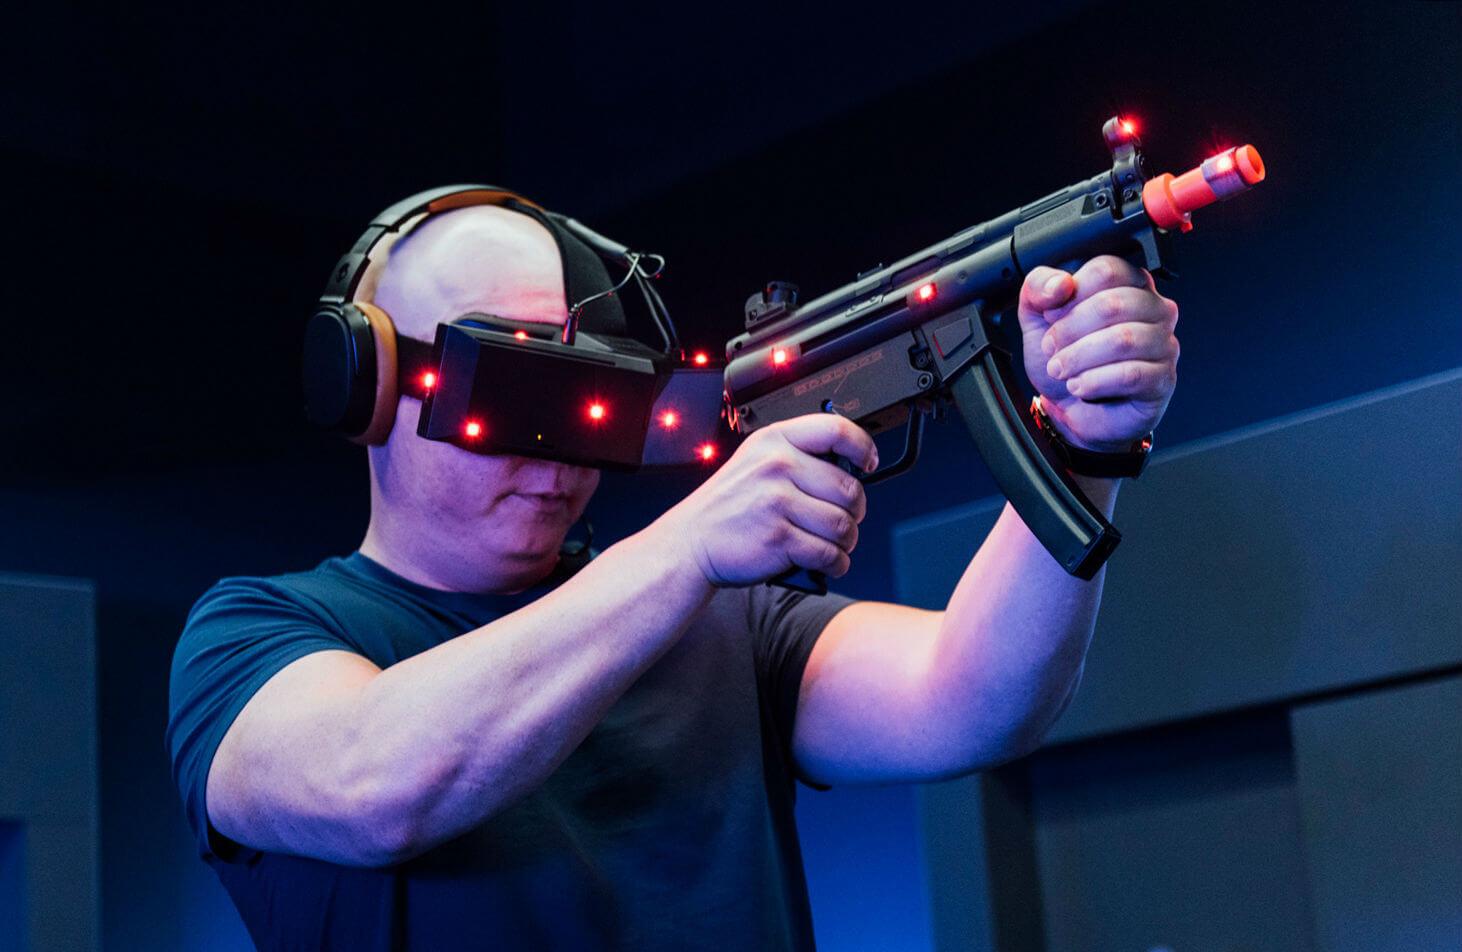 Playing John Wick in VR.